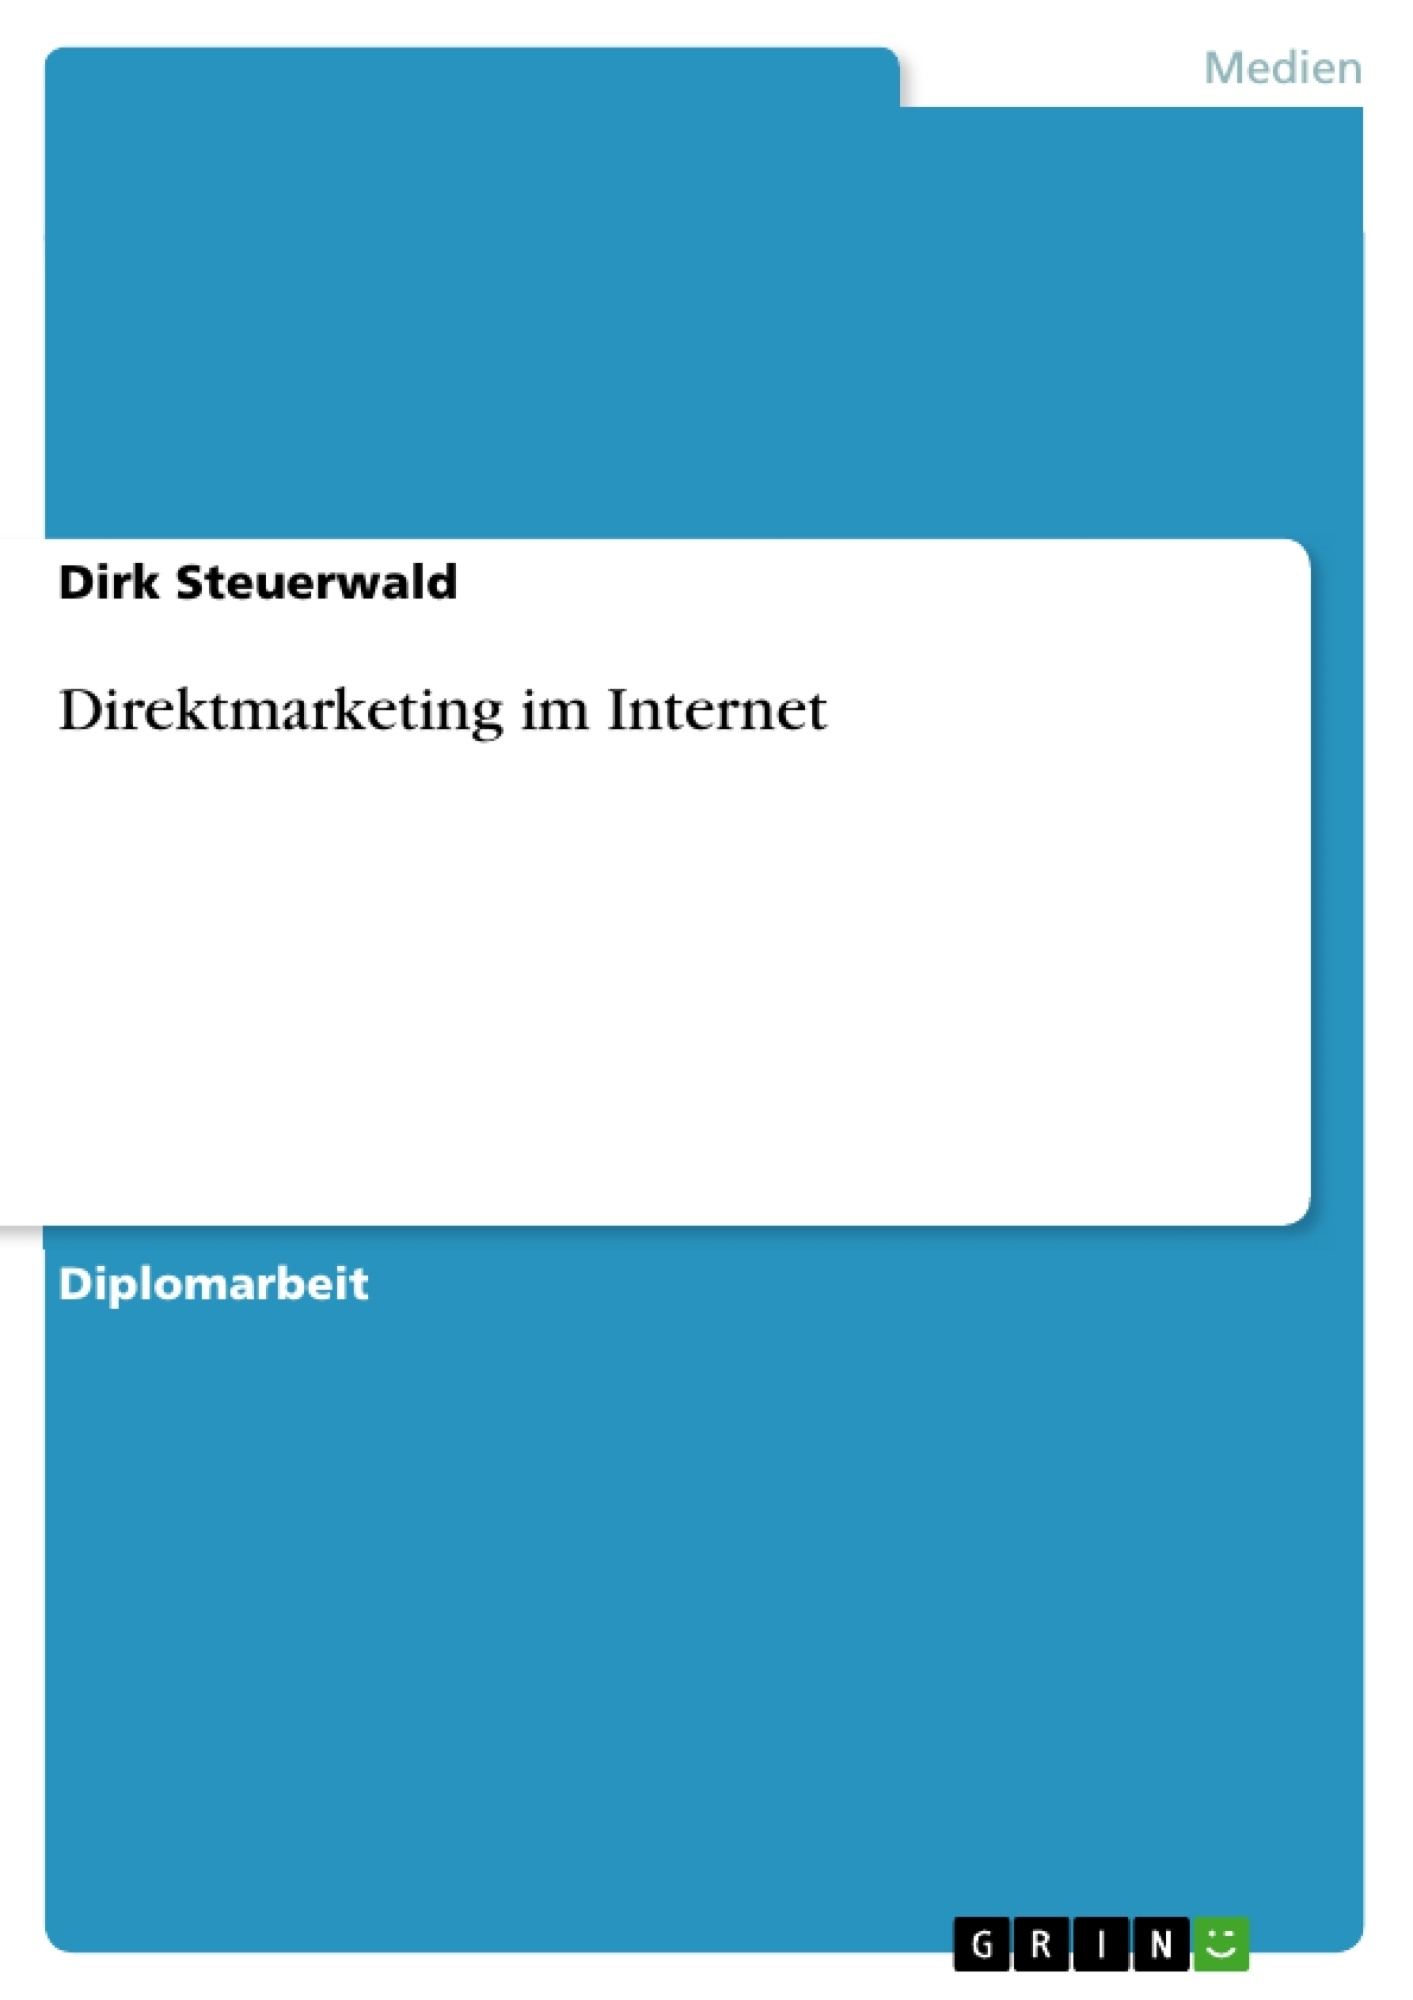 Titel: Direktmarketing im Internet